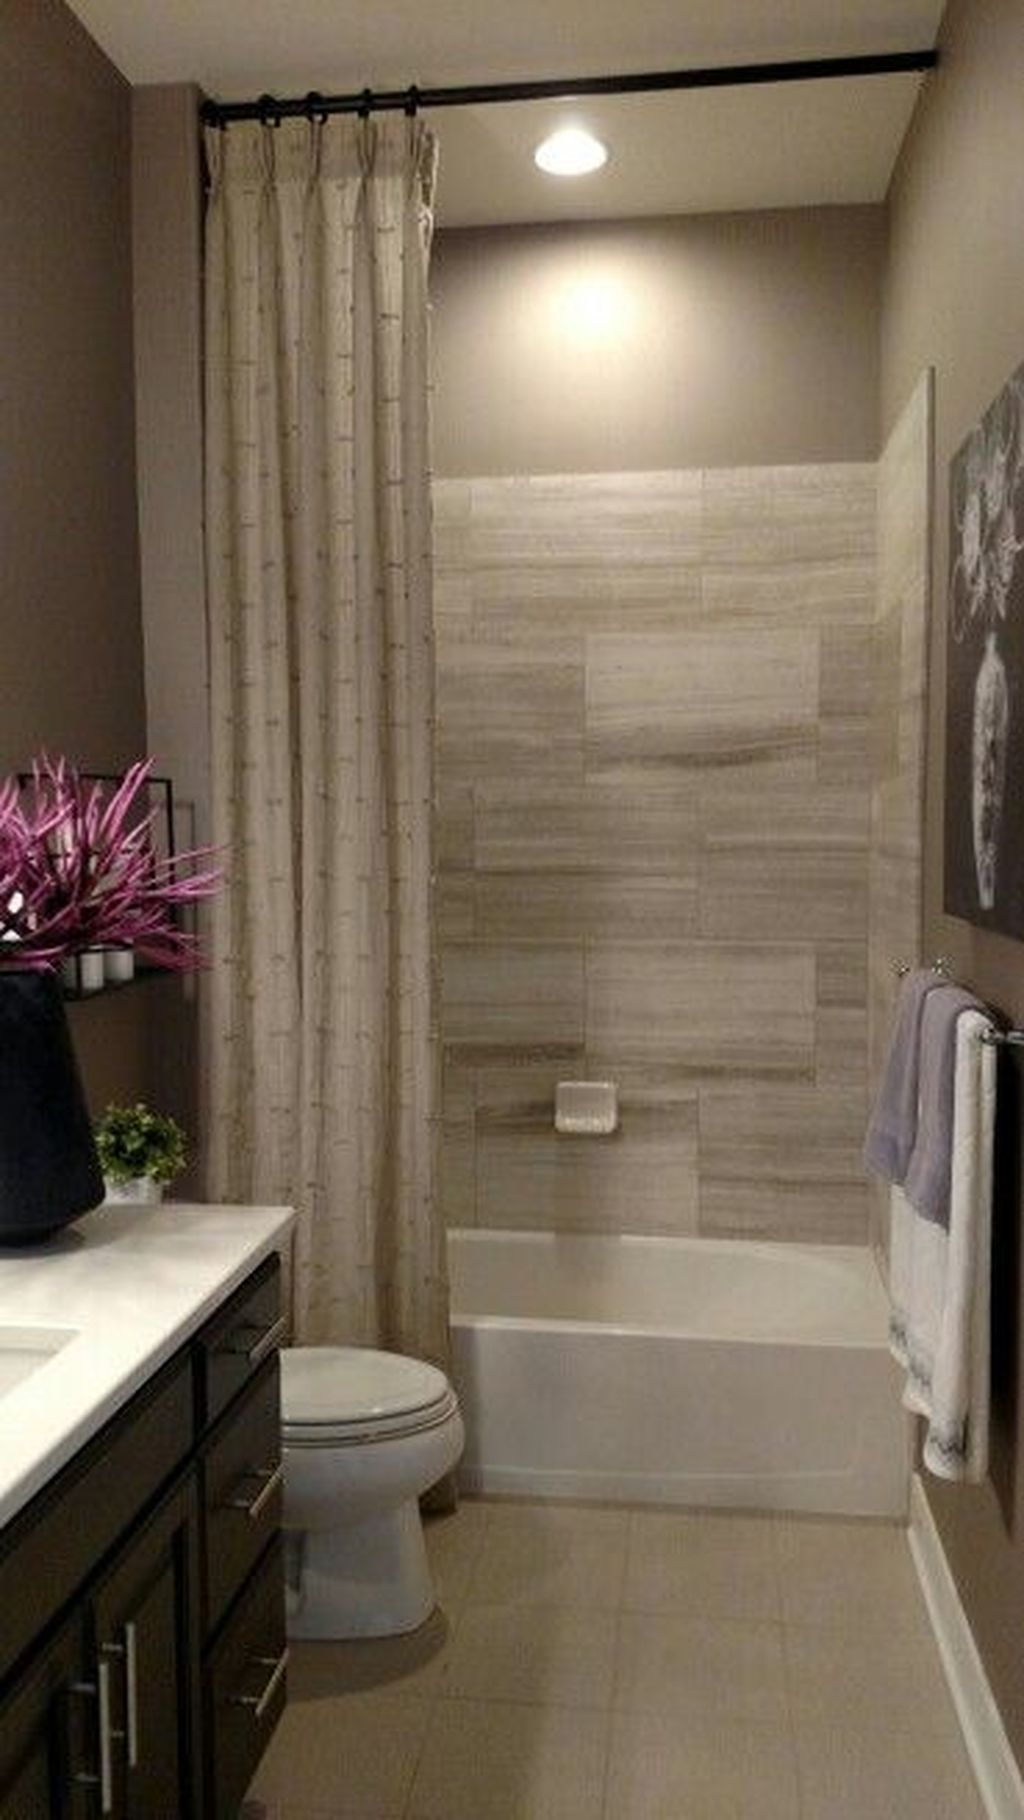 40 Inspiring Guest Bathroom Makeover Ideas